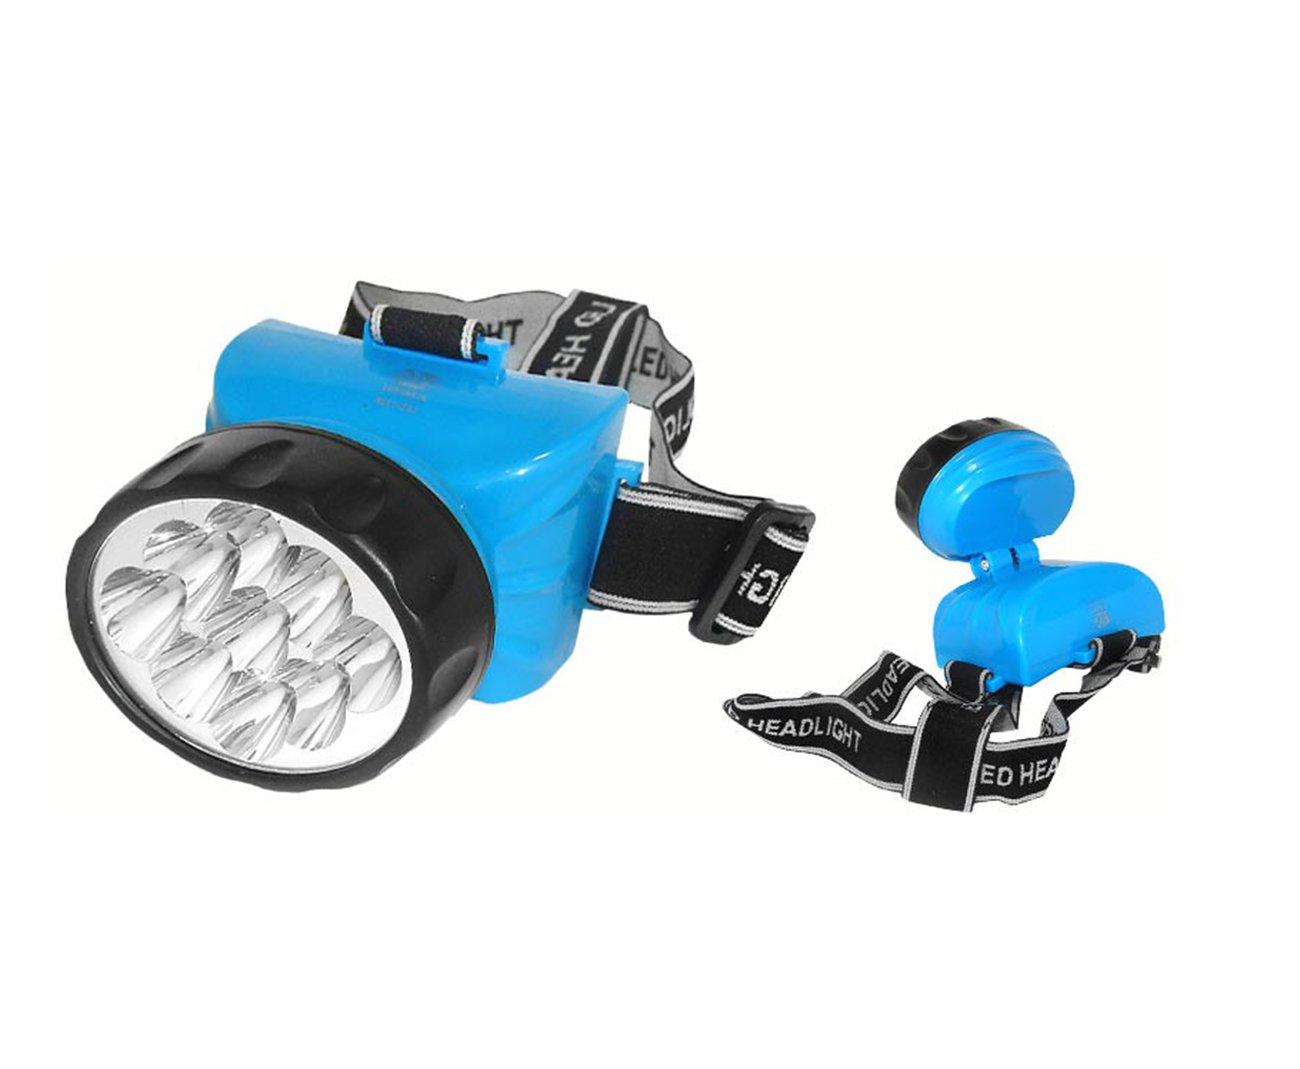 Lanterna Cabeça 722 B Recarregavel 12 Led - Albatroz